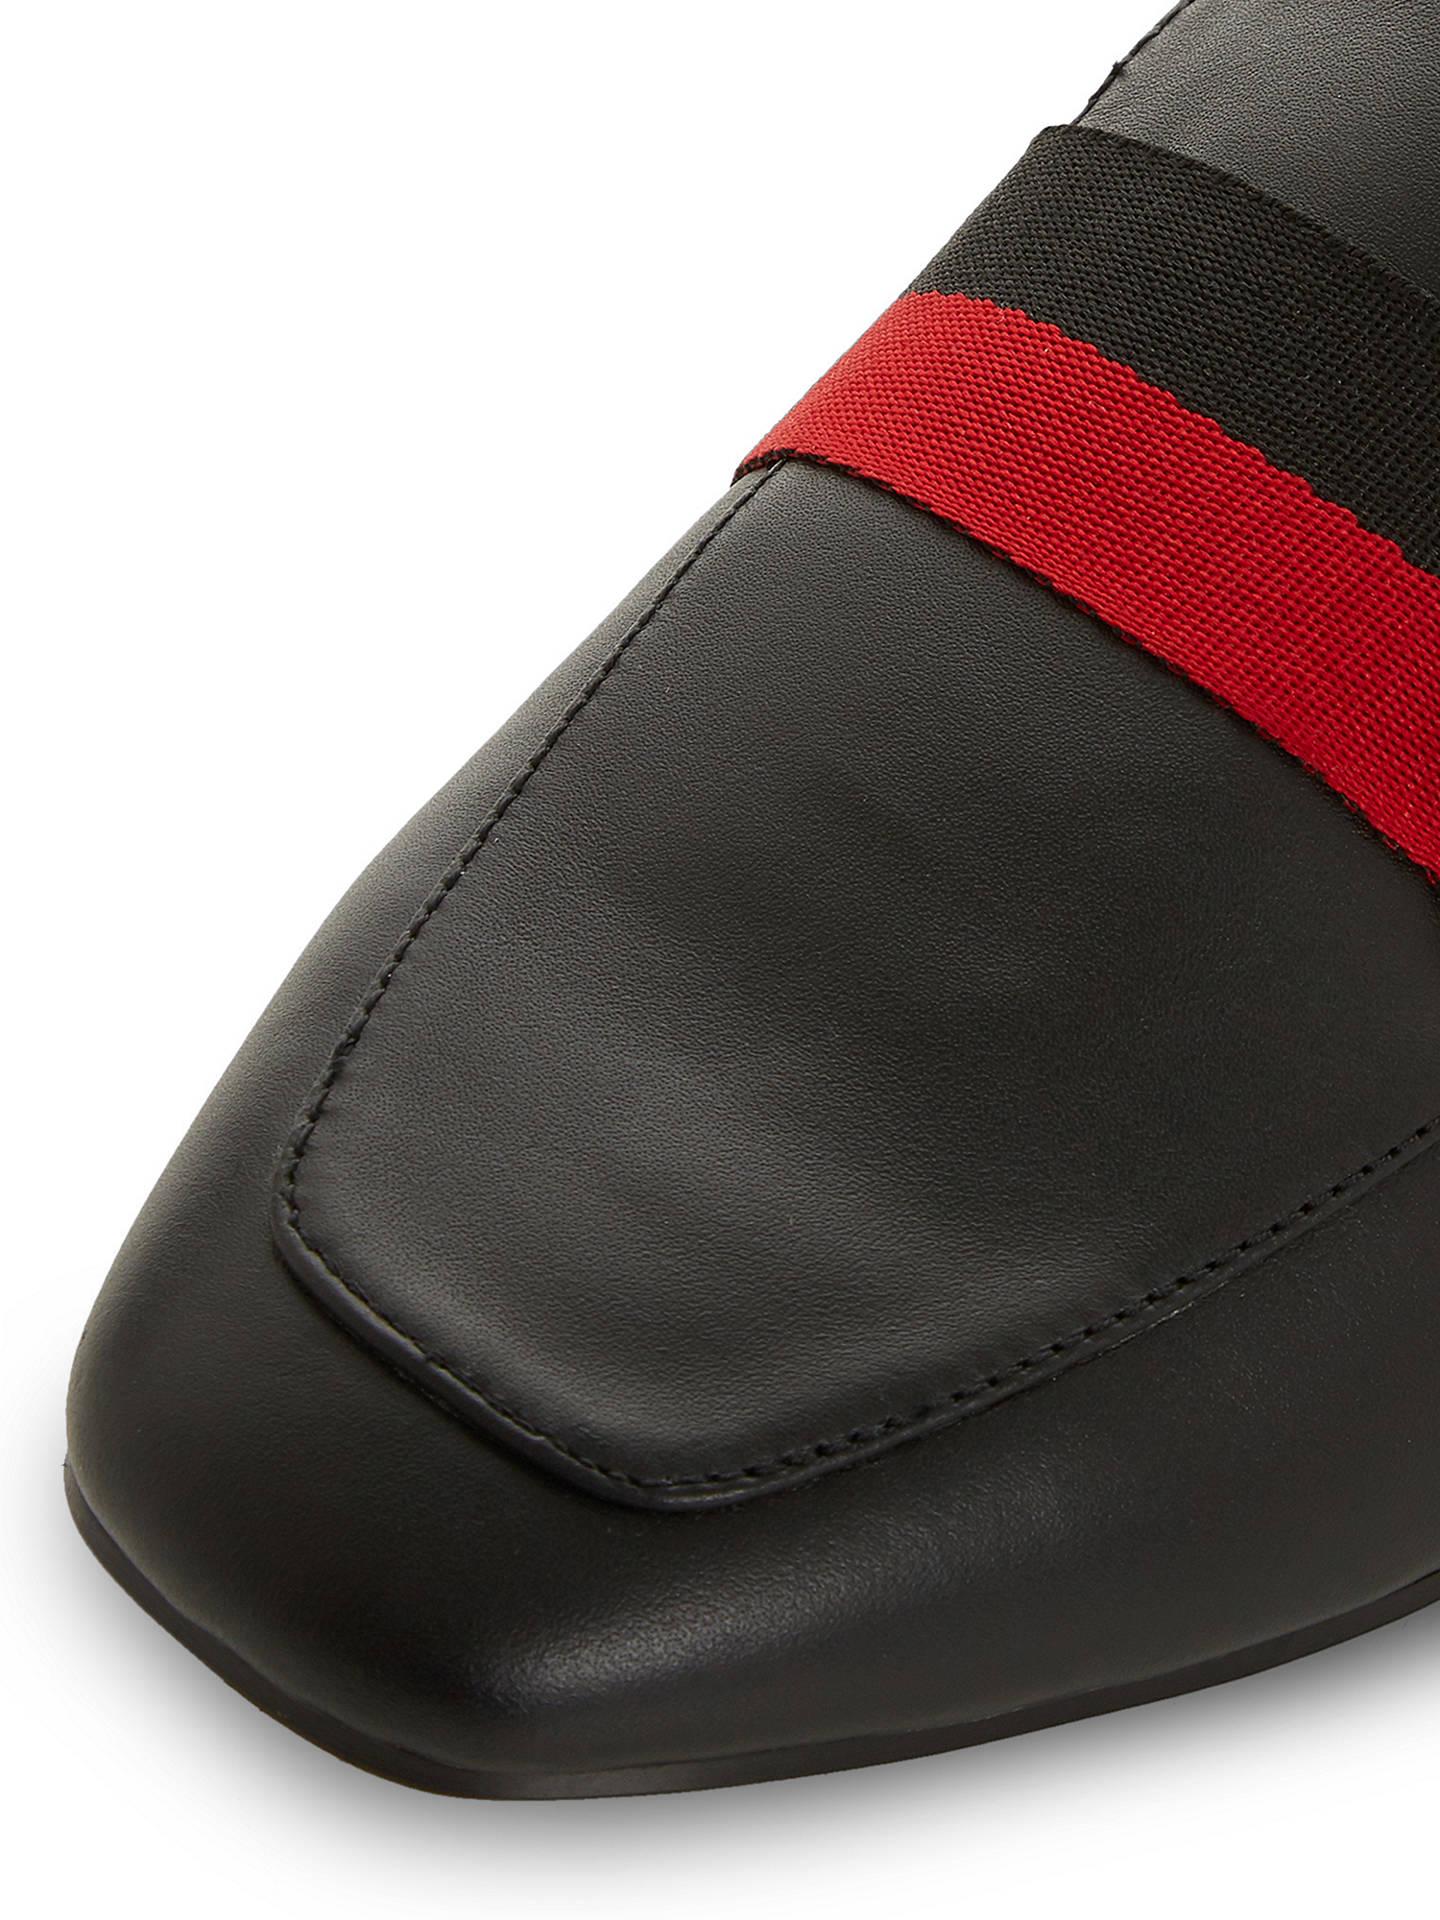 d4adfdd8dcd ... Buy Steve Madden Karisma Mule Loafers